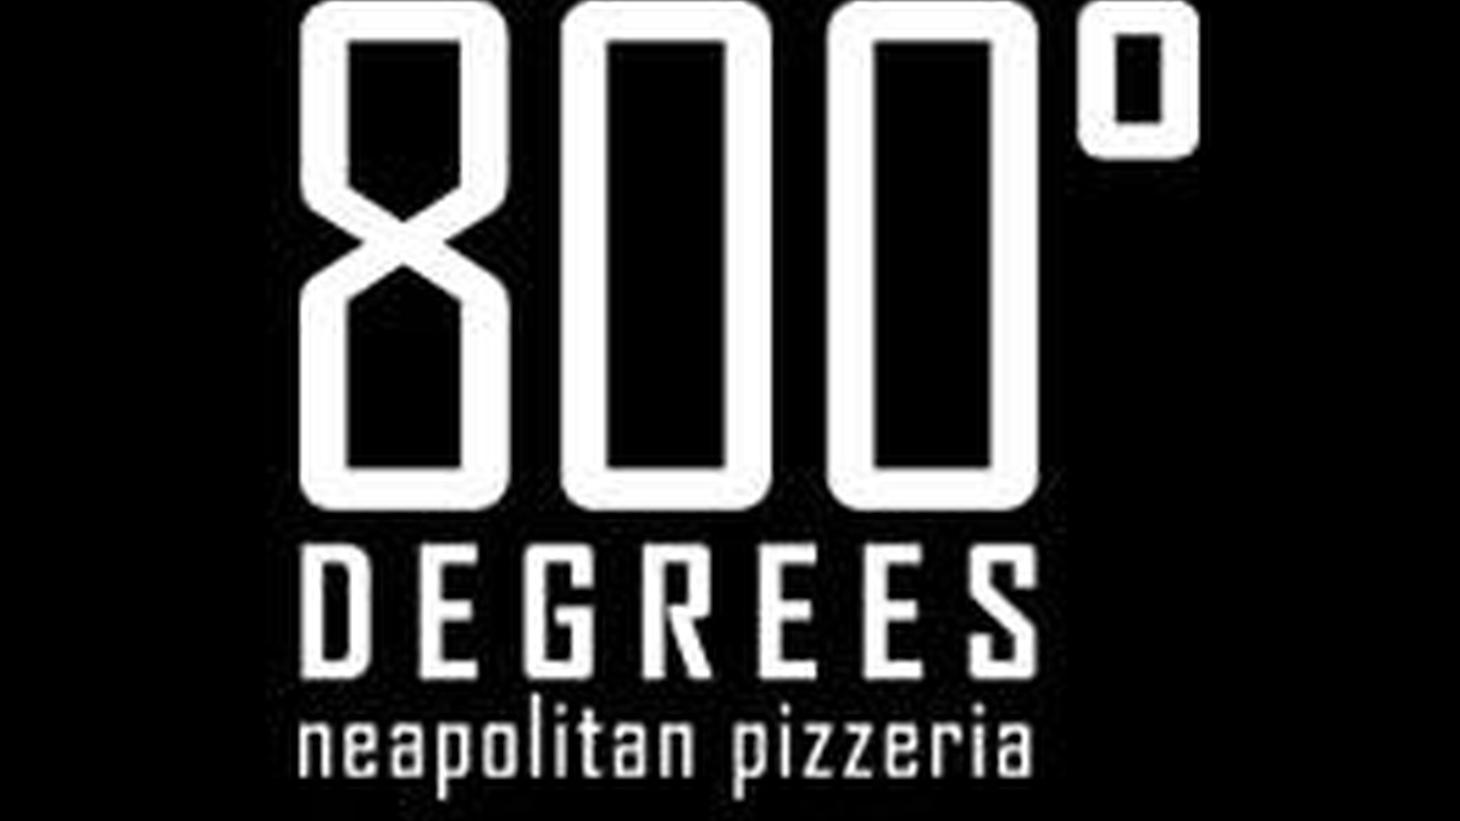 Jonathan Gold visits 800 Degrees Neapolitan Pizzeria, the latest venture from Adam Fleischman of Umami Burger fame.